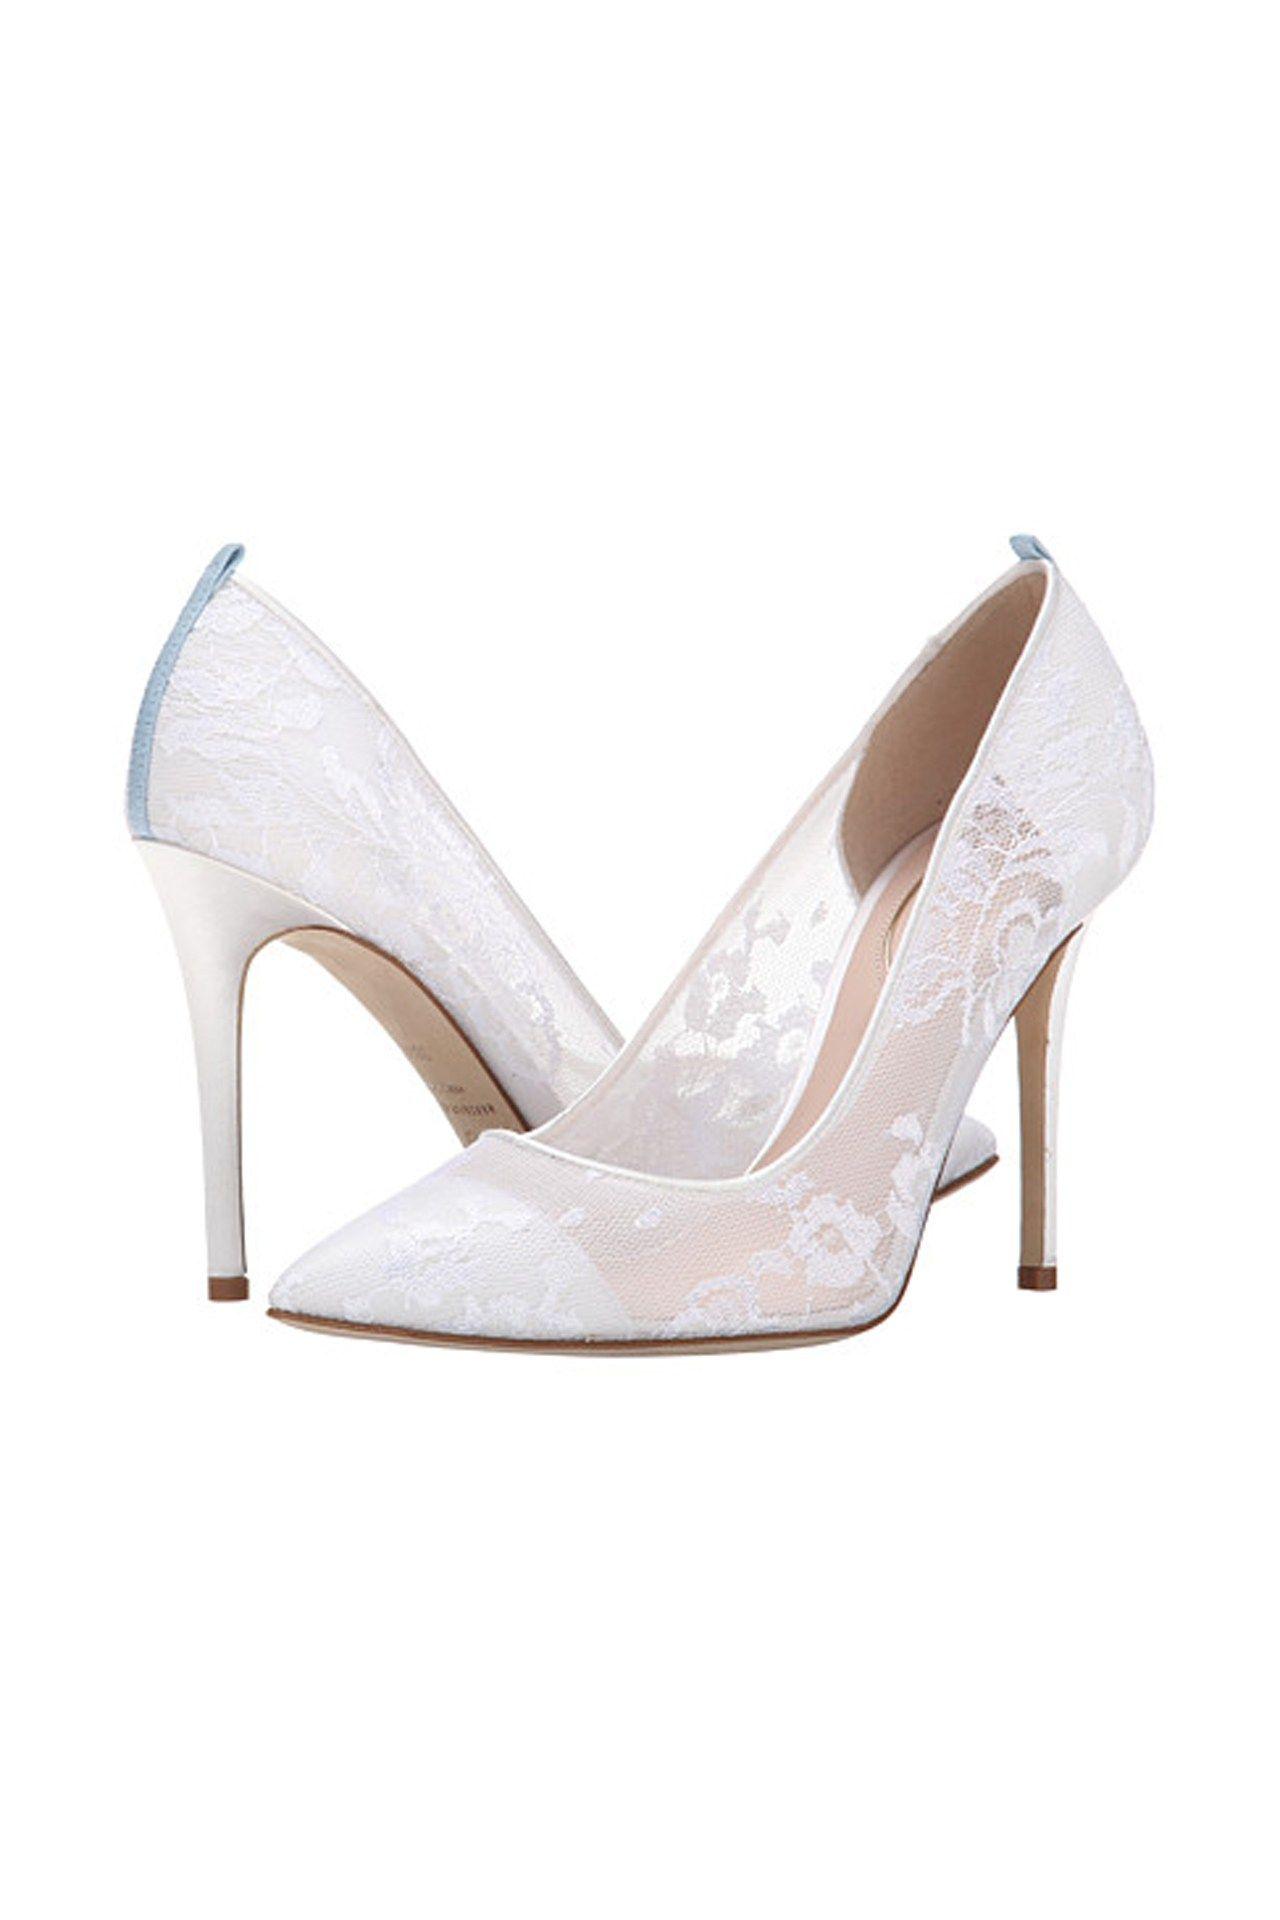 sjp launches wedding shoes sarah jessica parker mr big and manolo rh pinterest com